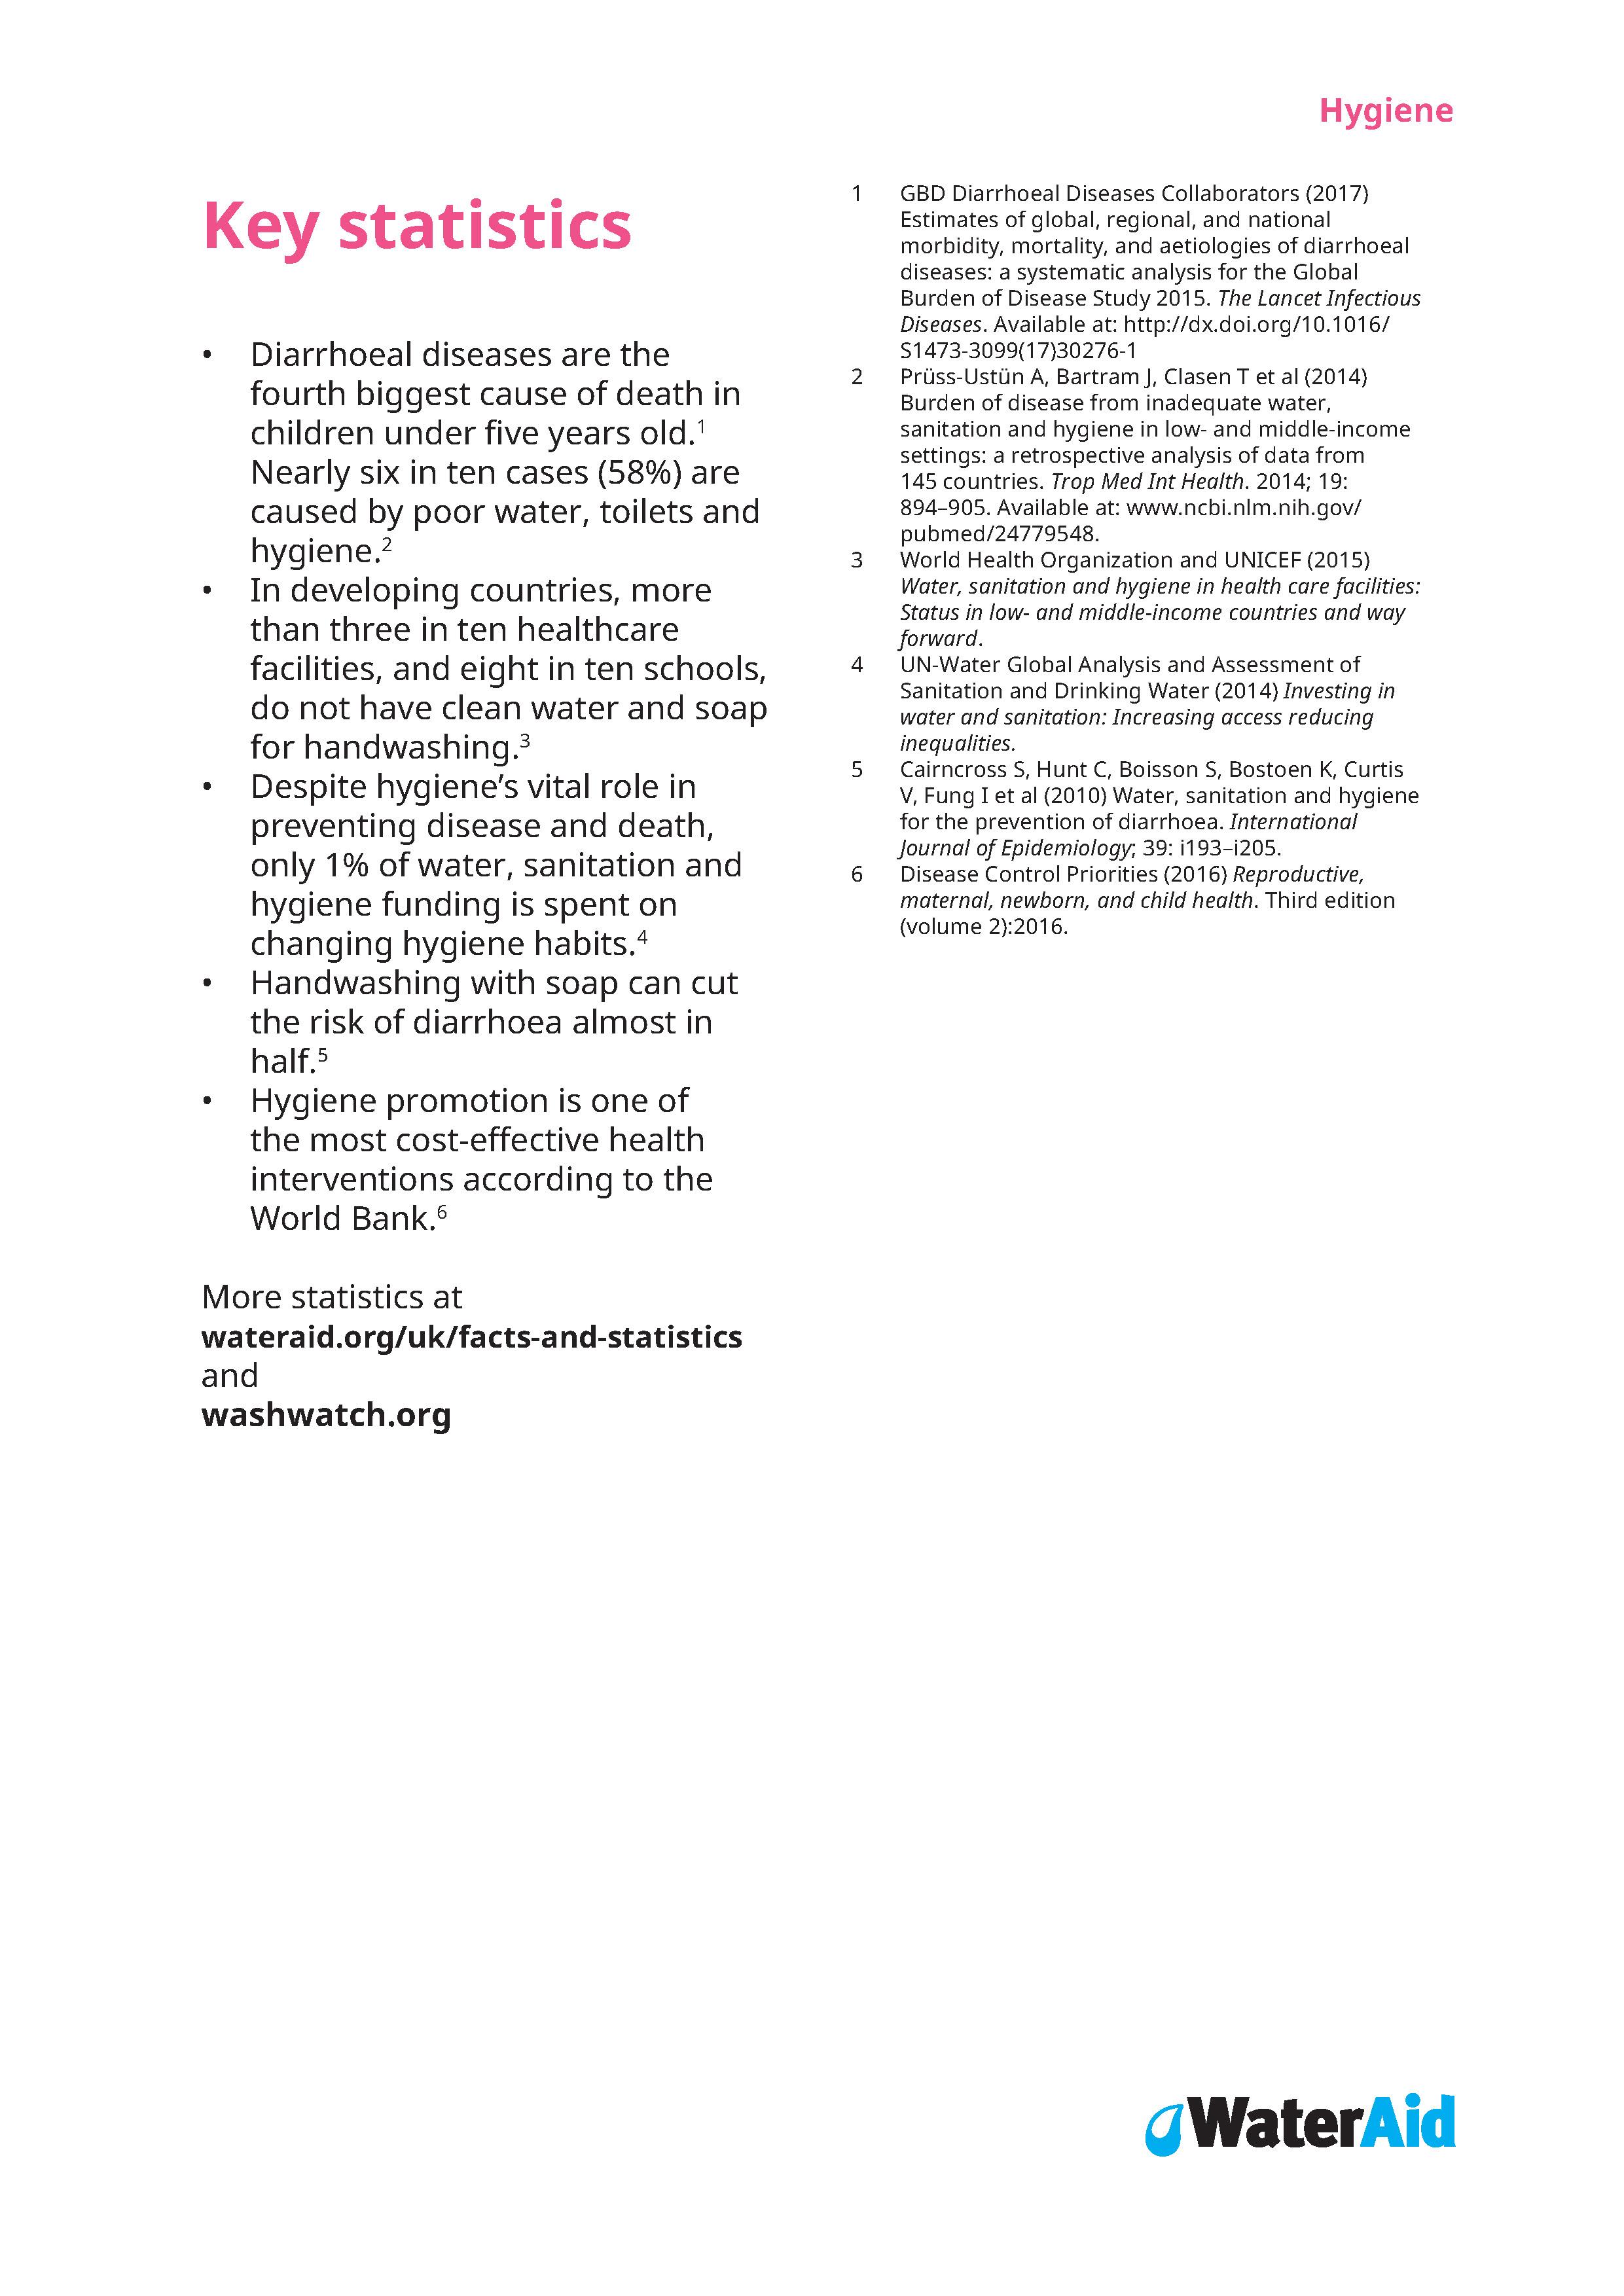 Hygiene toolkit_Page_3.jpg